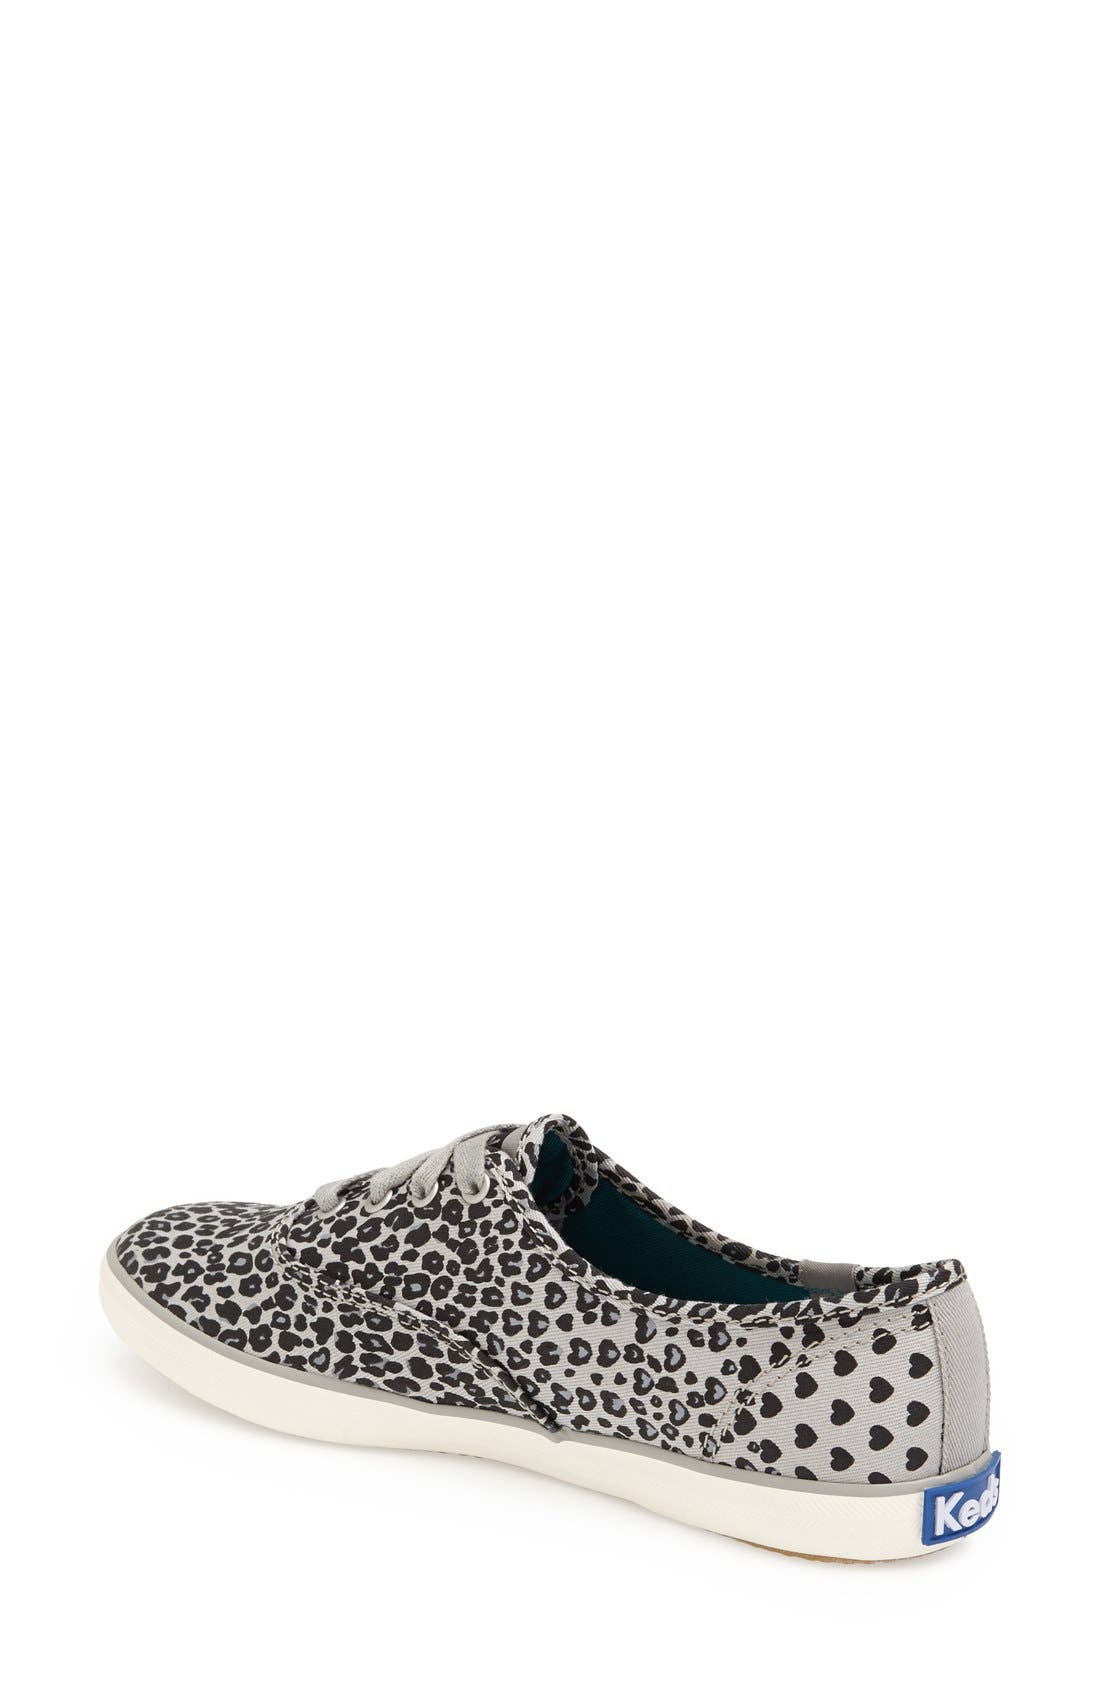 KEDS<SUP>®</SUP>,                             'Champion - Leopard' Sneaker,                             Alternate thumbnail 2, color,                             001